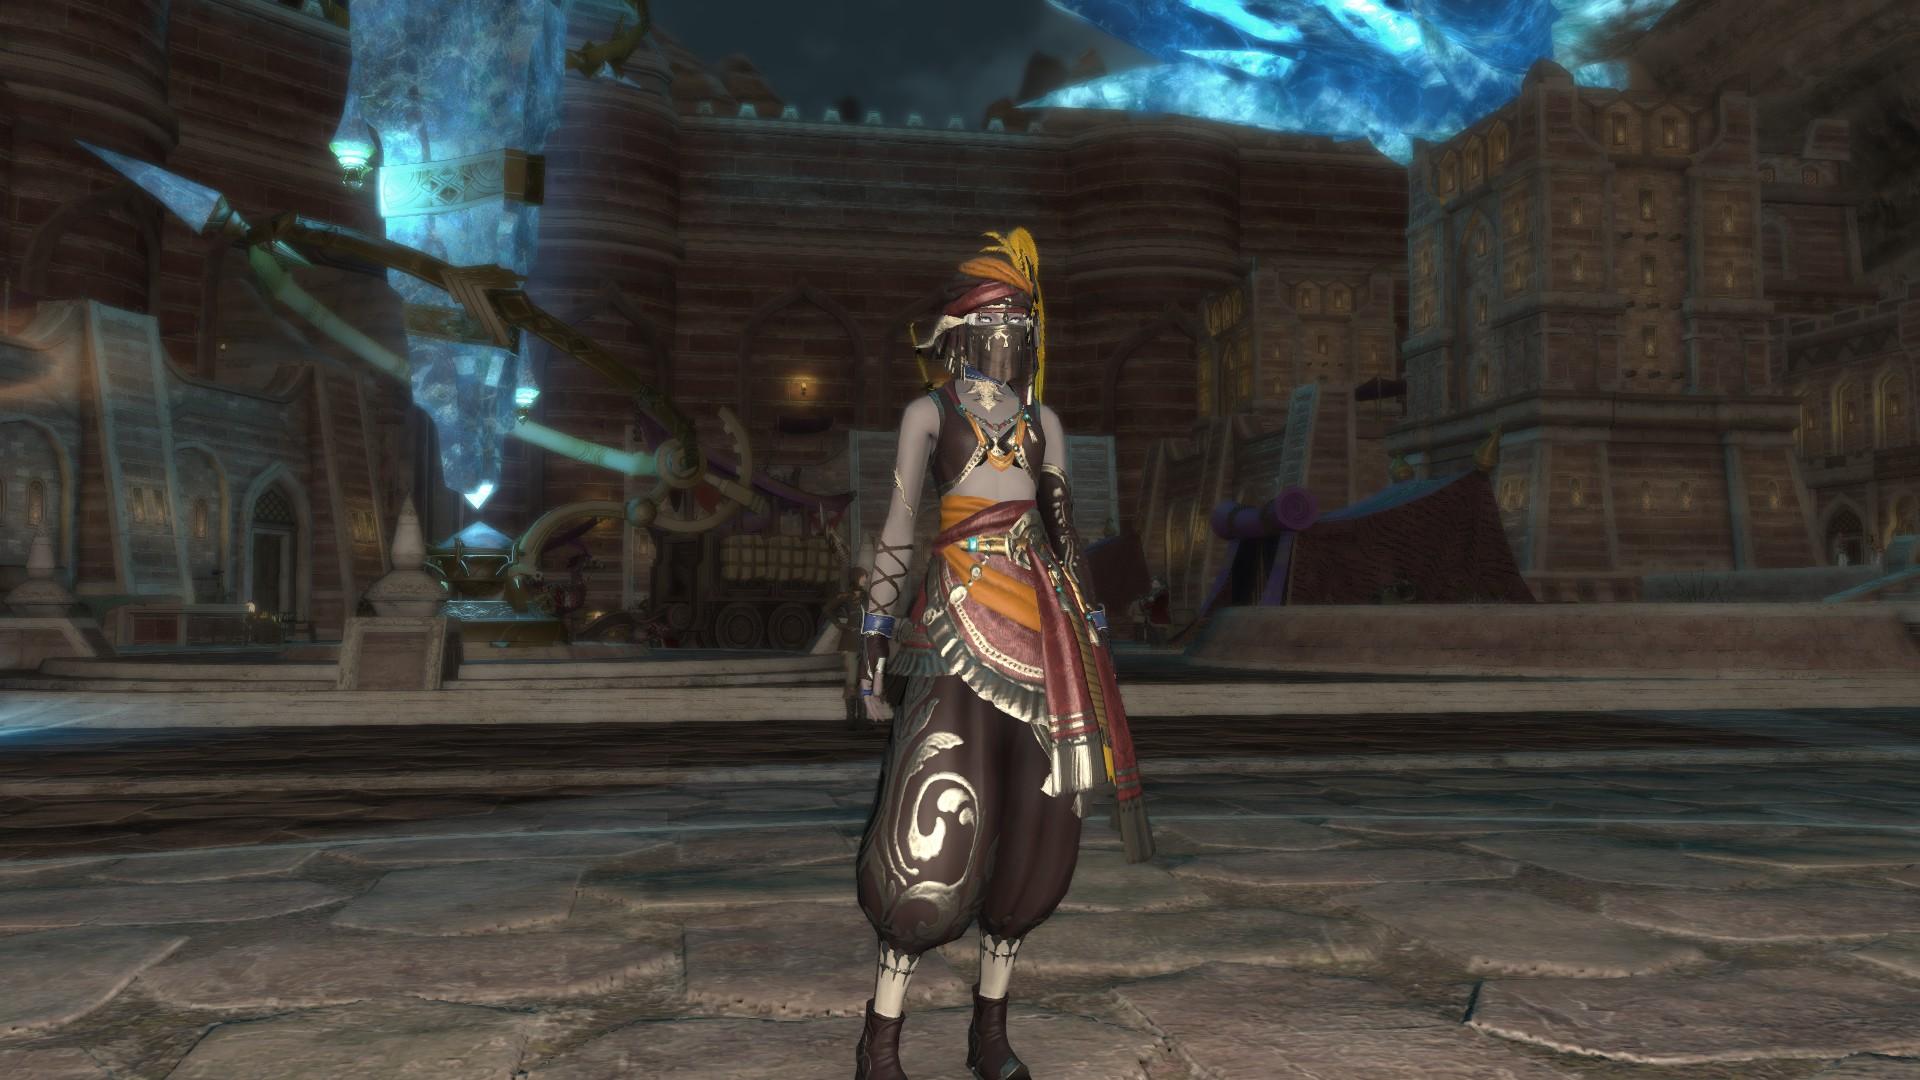 Final Fantasy XIV: Stormblood |OT| Y'all Need to Calm Down